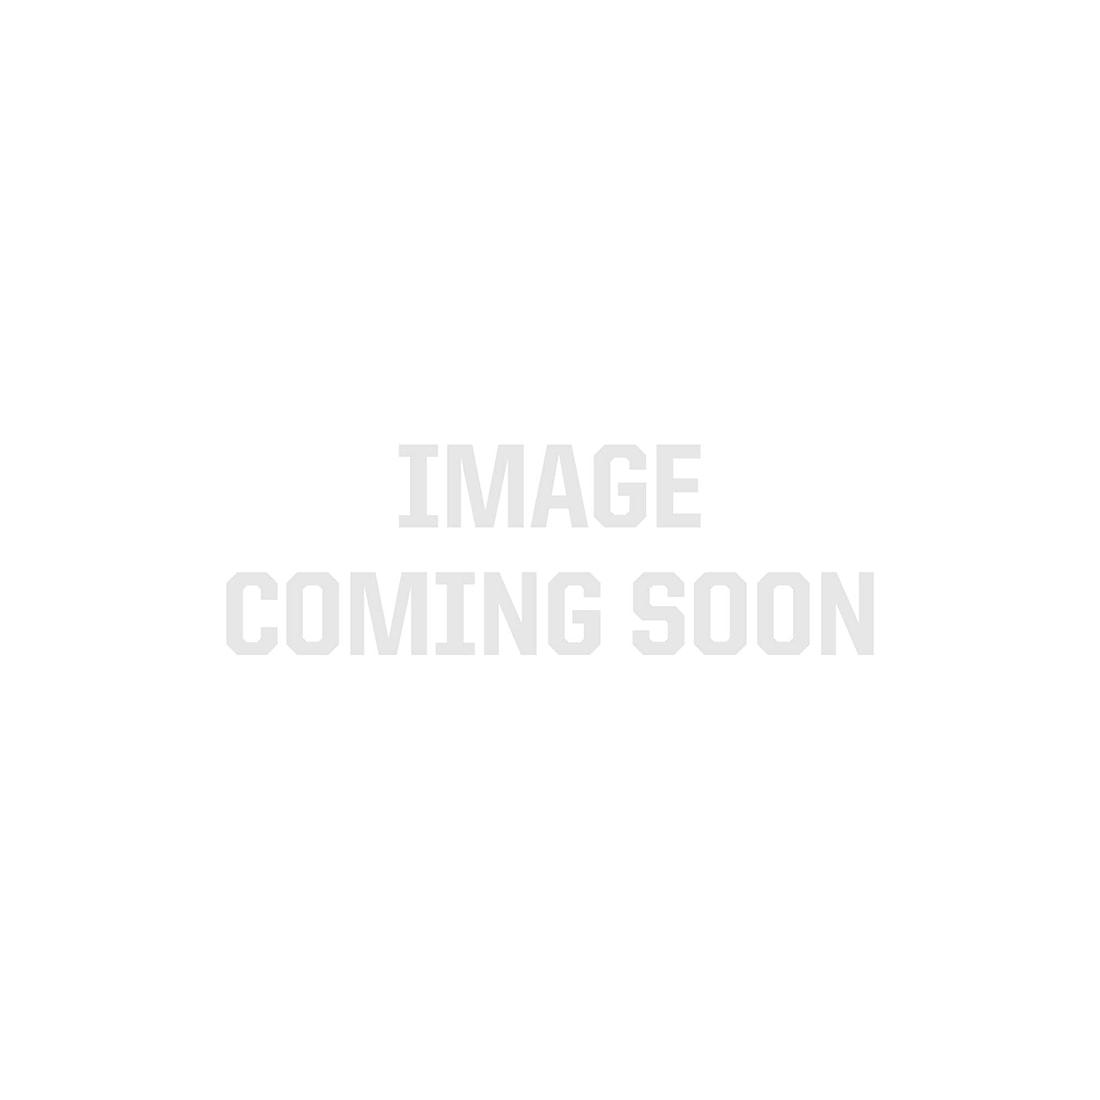 Waterproof Soft White 3014 Side View LED Strip Light, 96/m, 8mm wide, Sample Kit